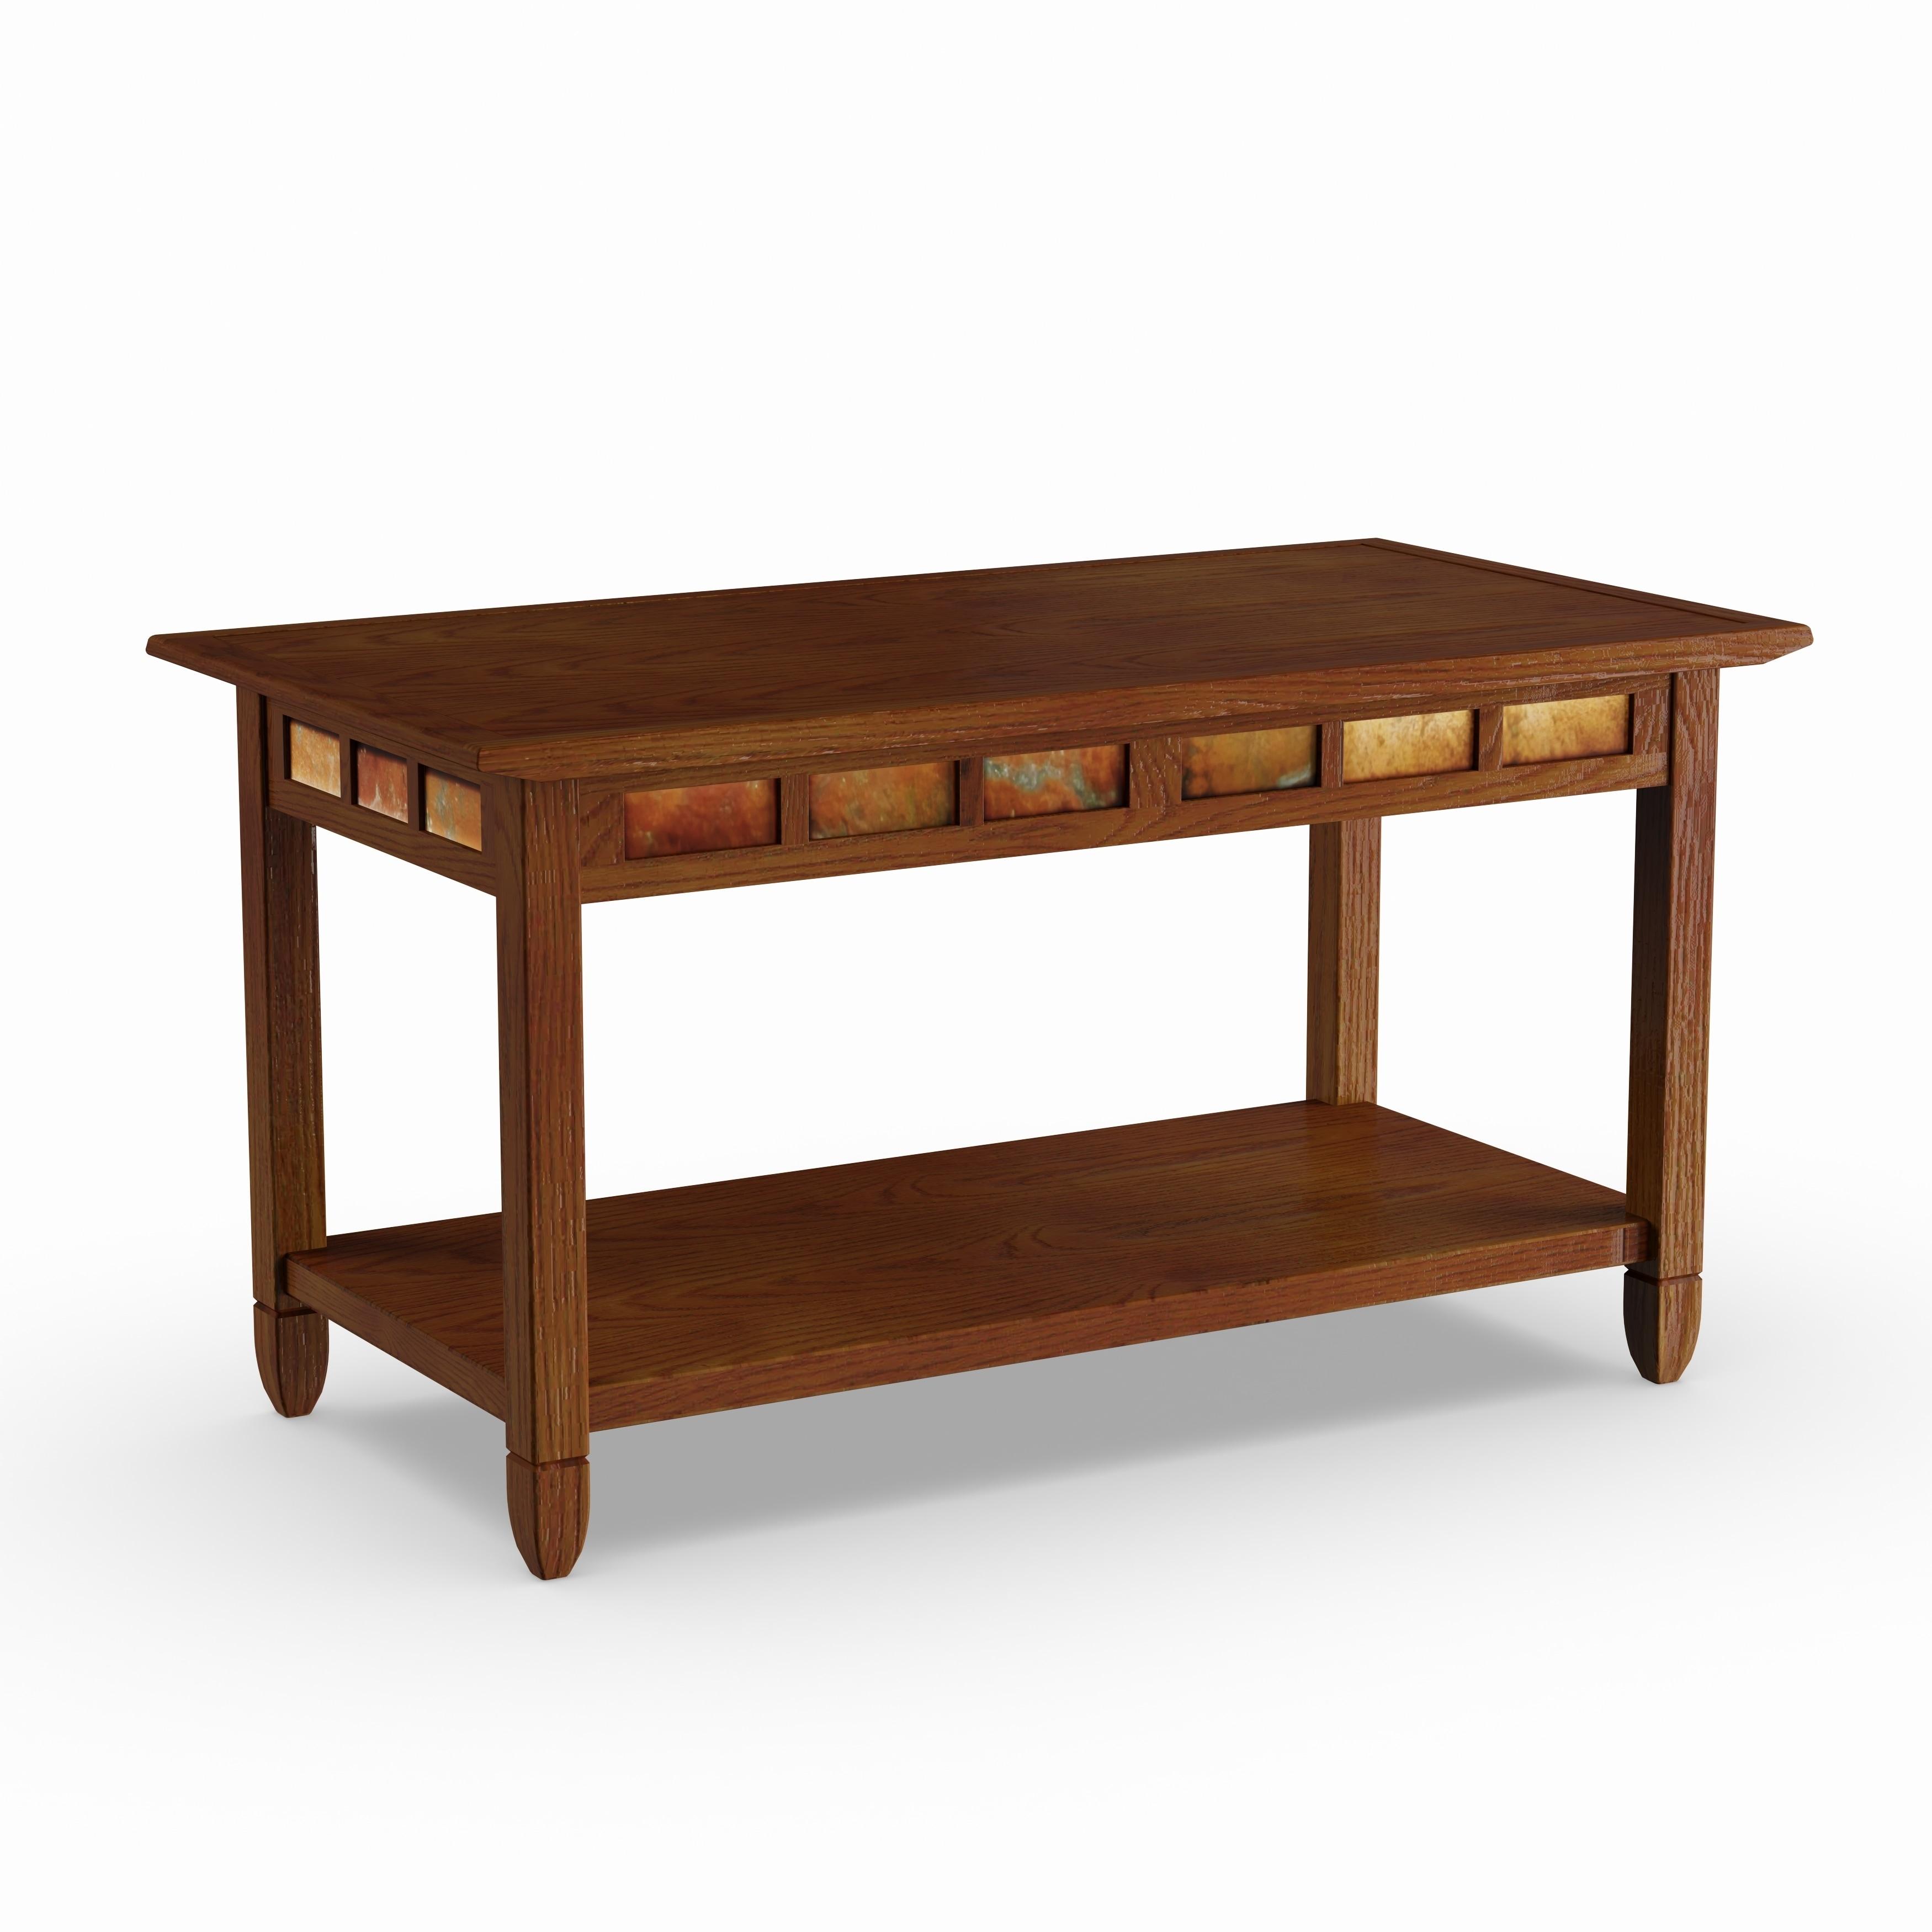 KD Furnishings Favorite Finds Rustic Oak and Slate Tile C...